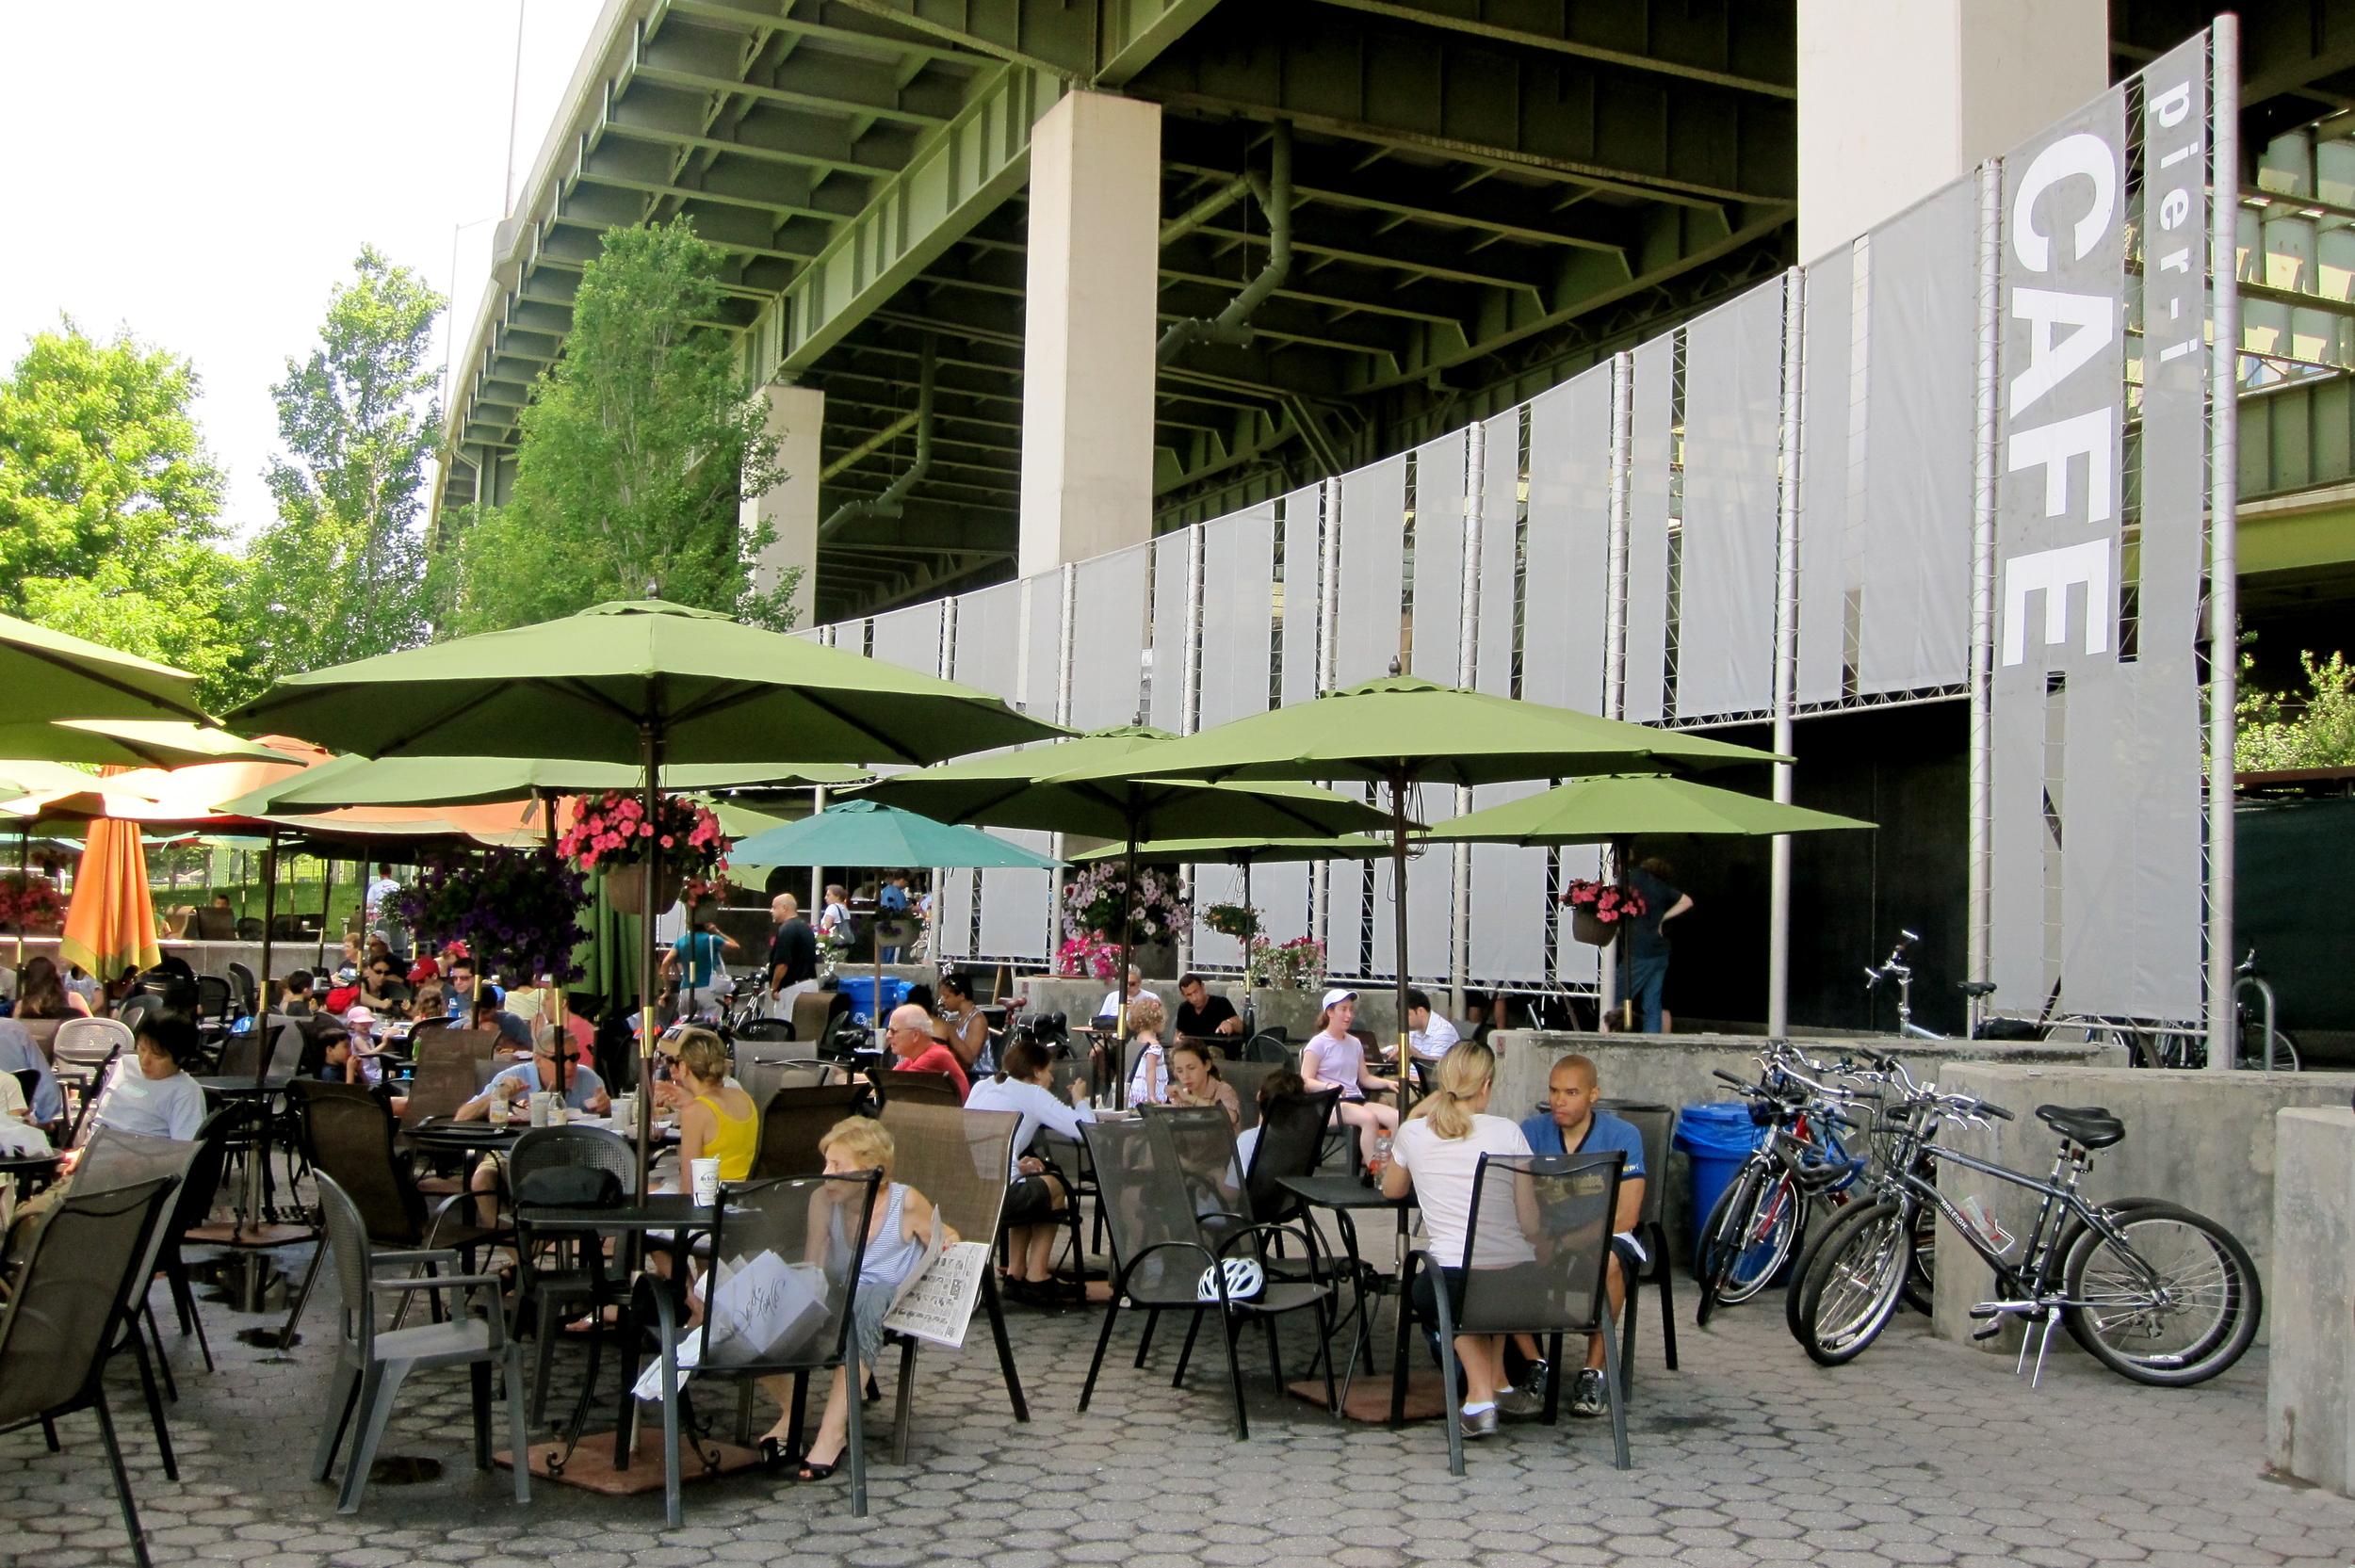 Pier i Cafe (5:30 pm)